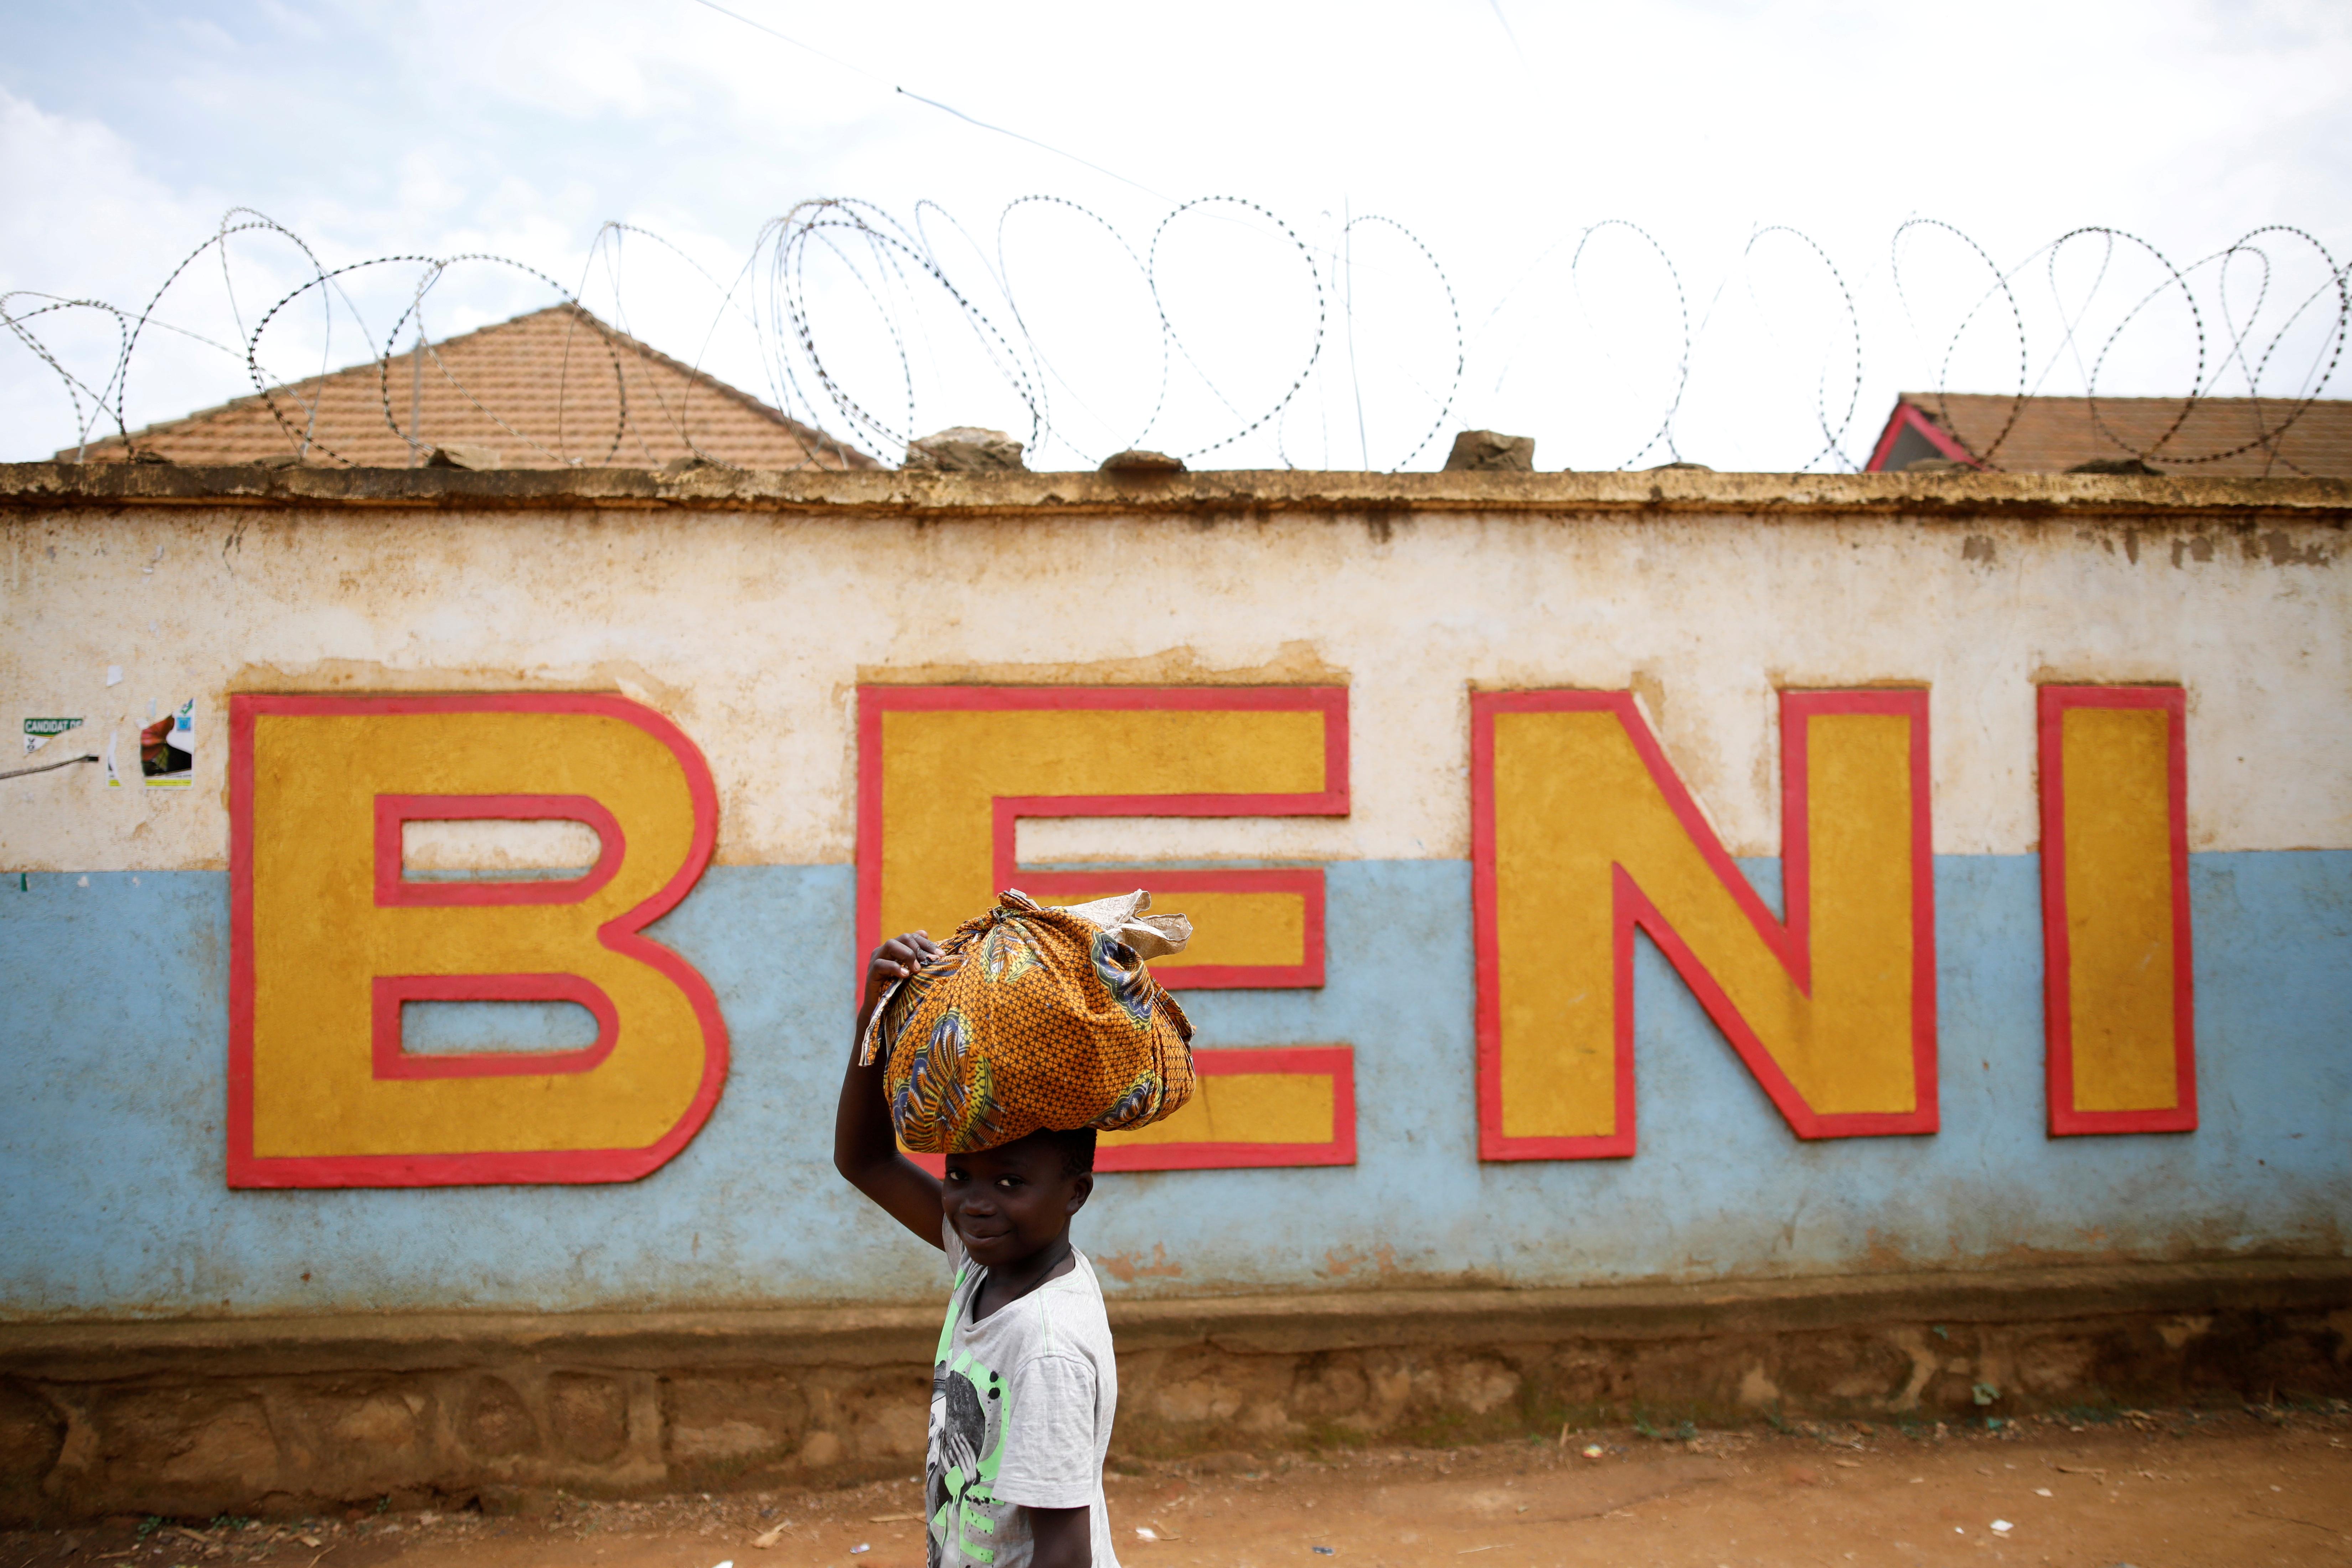 A Congolese boy walks past a wall near the Alima Ebola treatment centre in Beni, in the Democratic Republic of Congo, April 1, 2019. REUTERS/Baz Ratner/File Photo